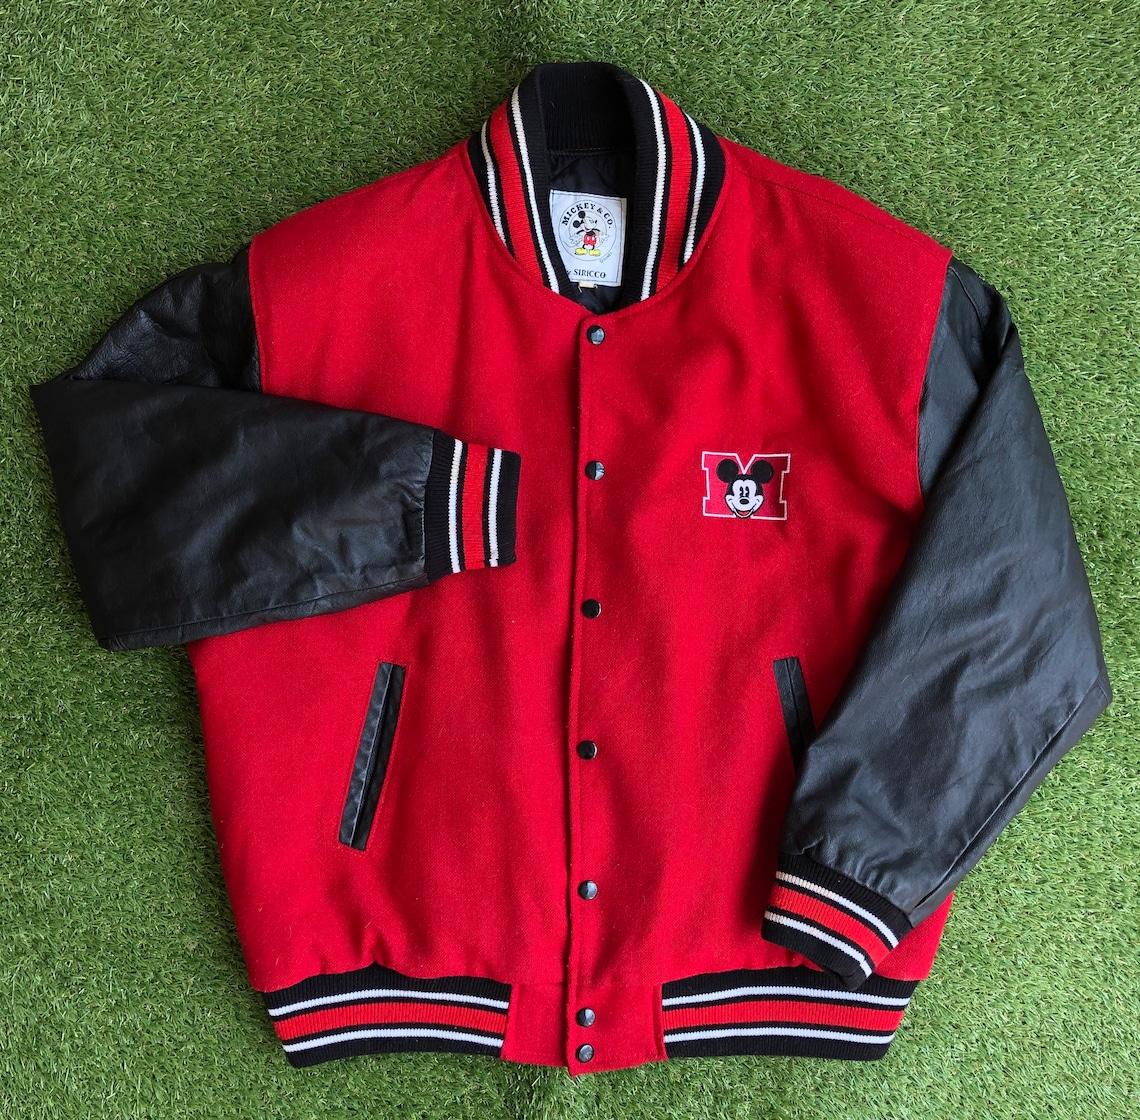 Vintage 1990's Disney Mickey Mouse Varsity Letterman Large Oversized Jacket Retro Hip Hop Streetwear Outerwear Bomber